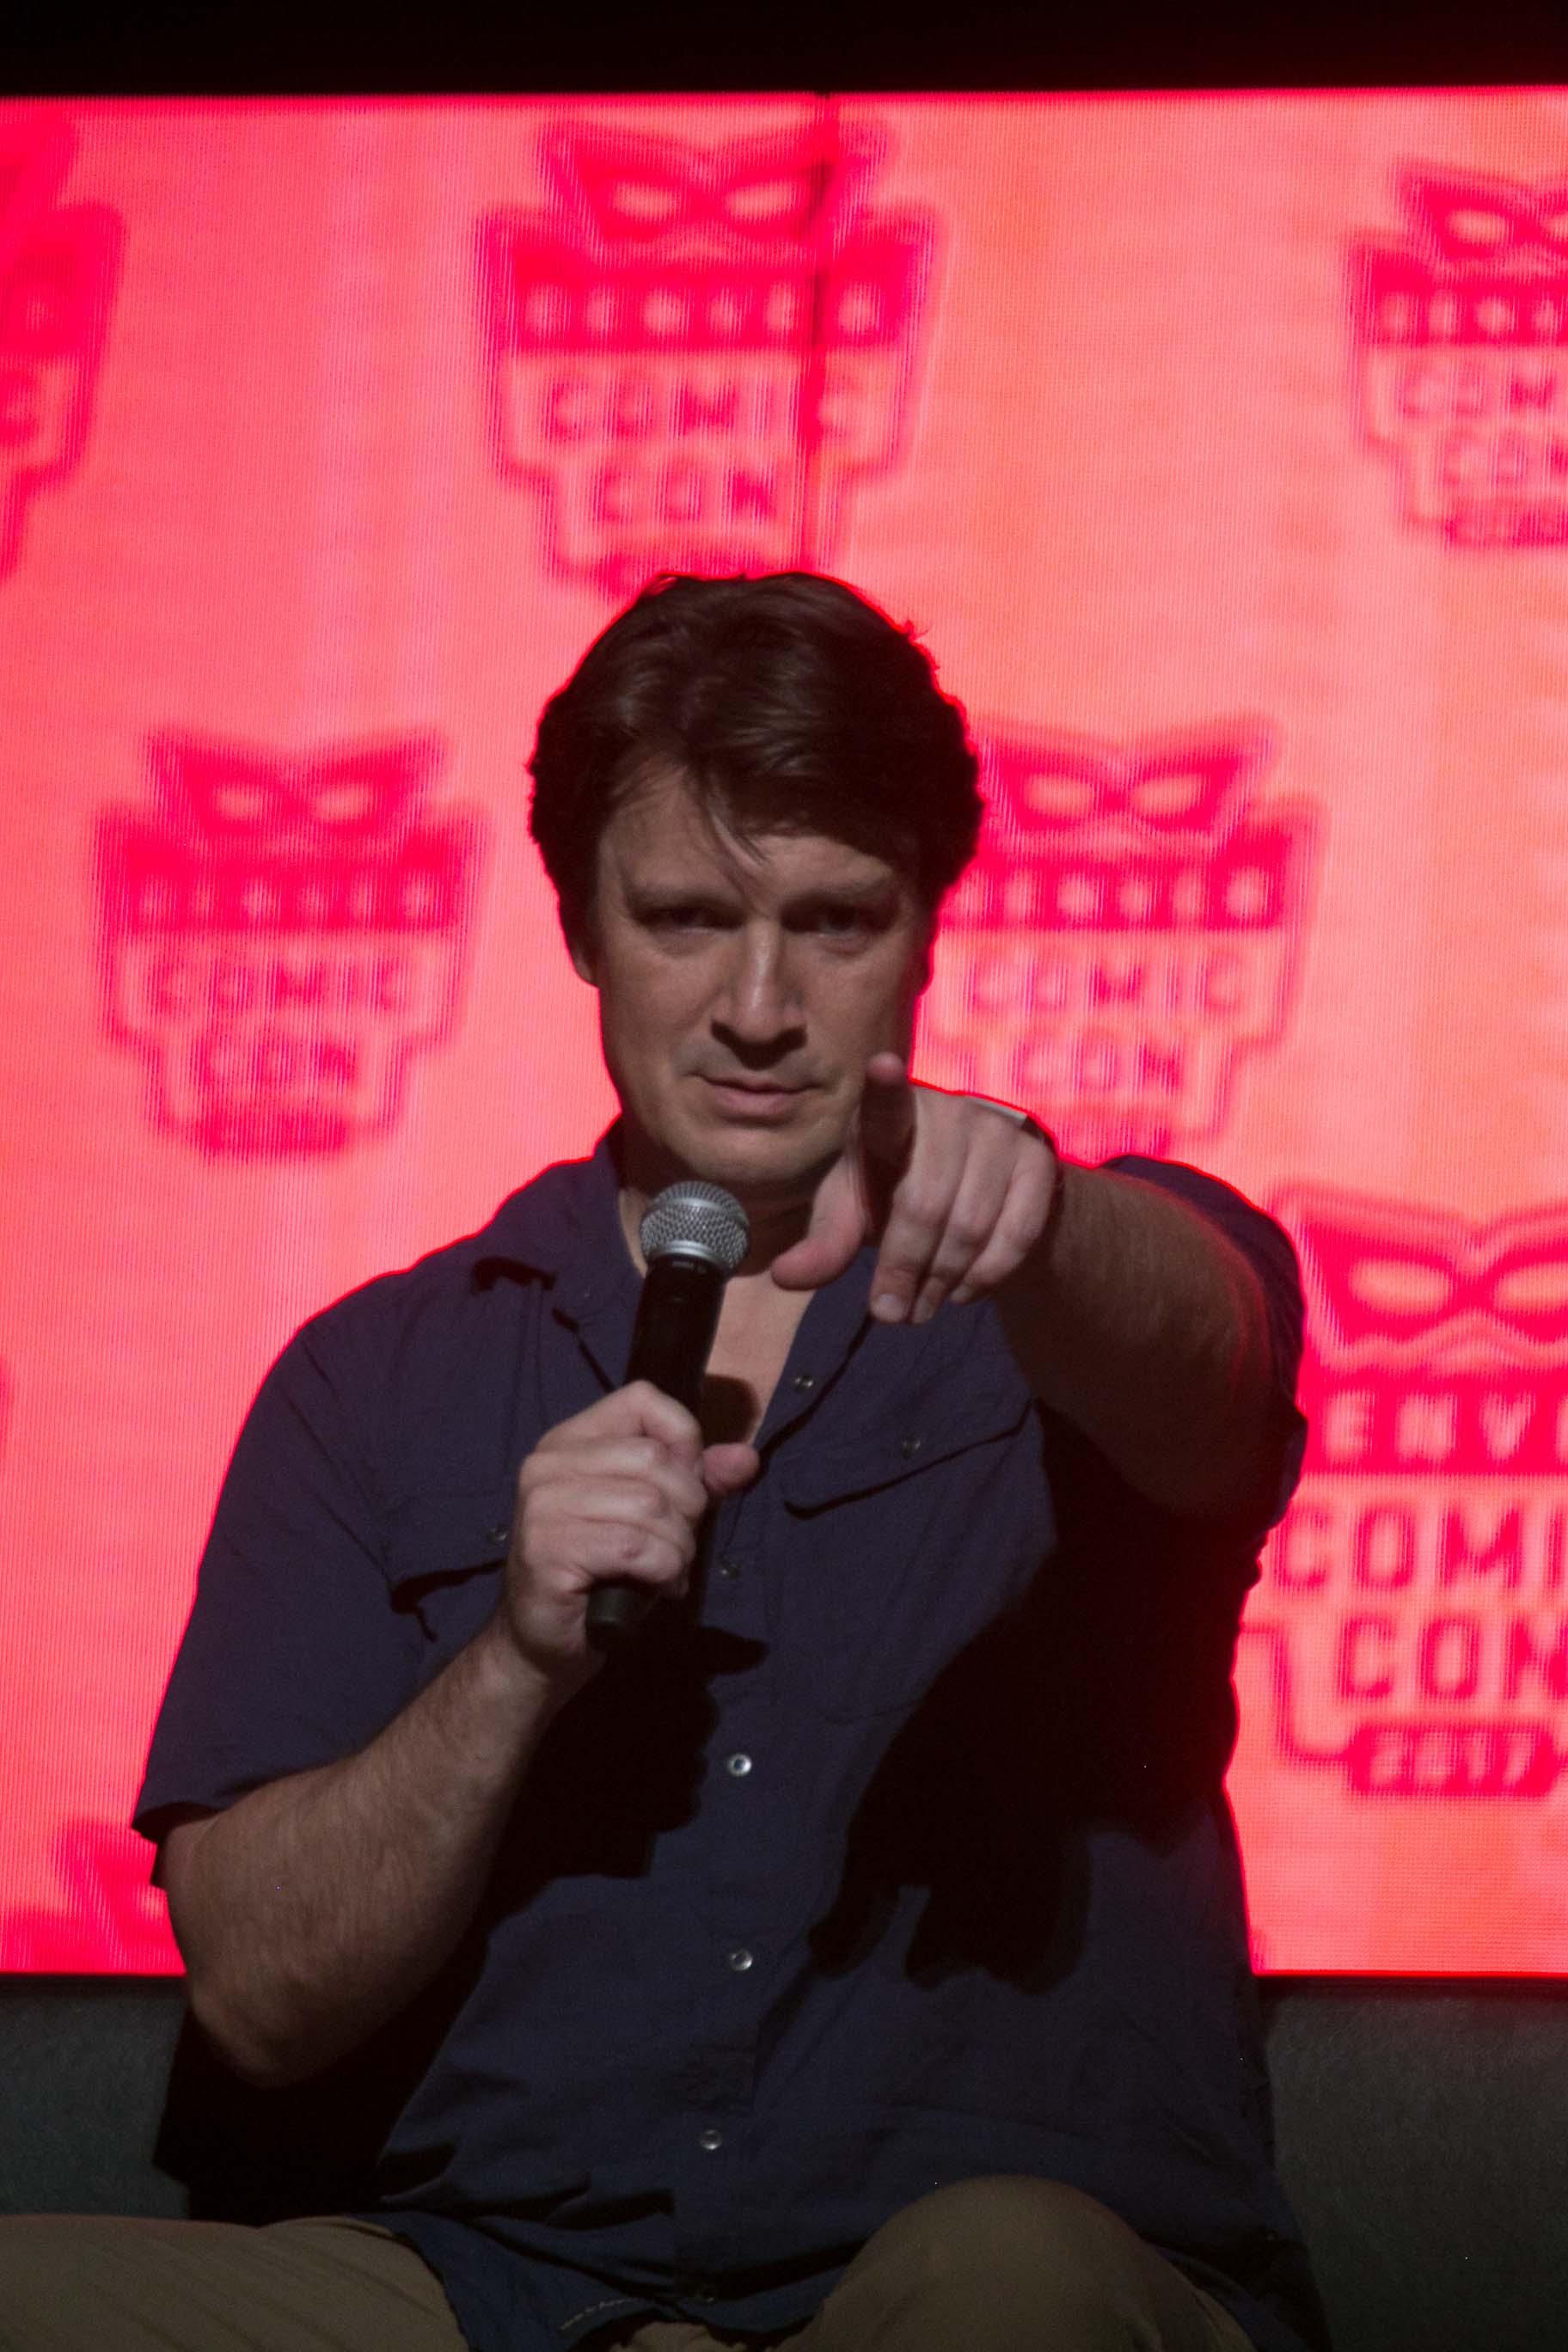 Denver Comic Con 2017 - Denver, Colorado